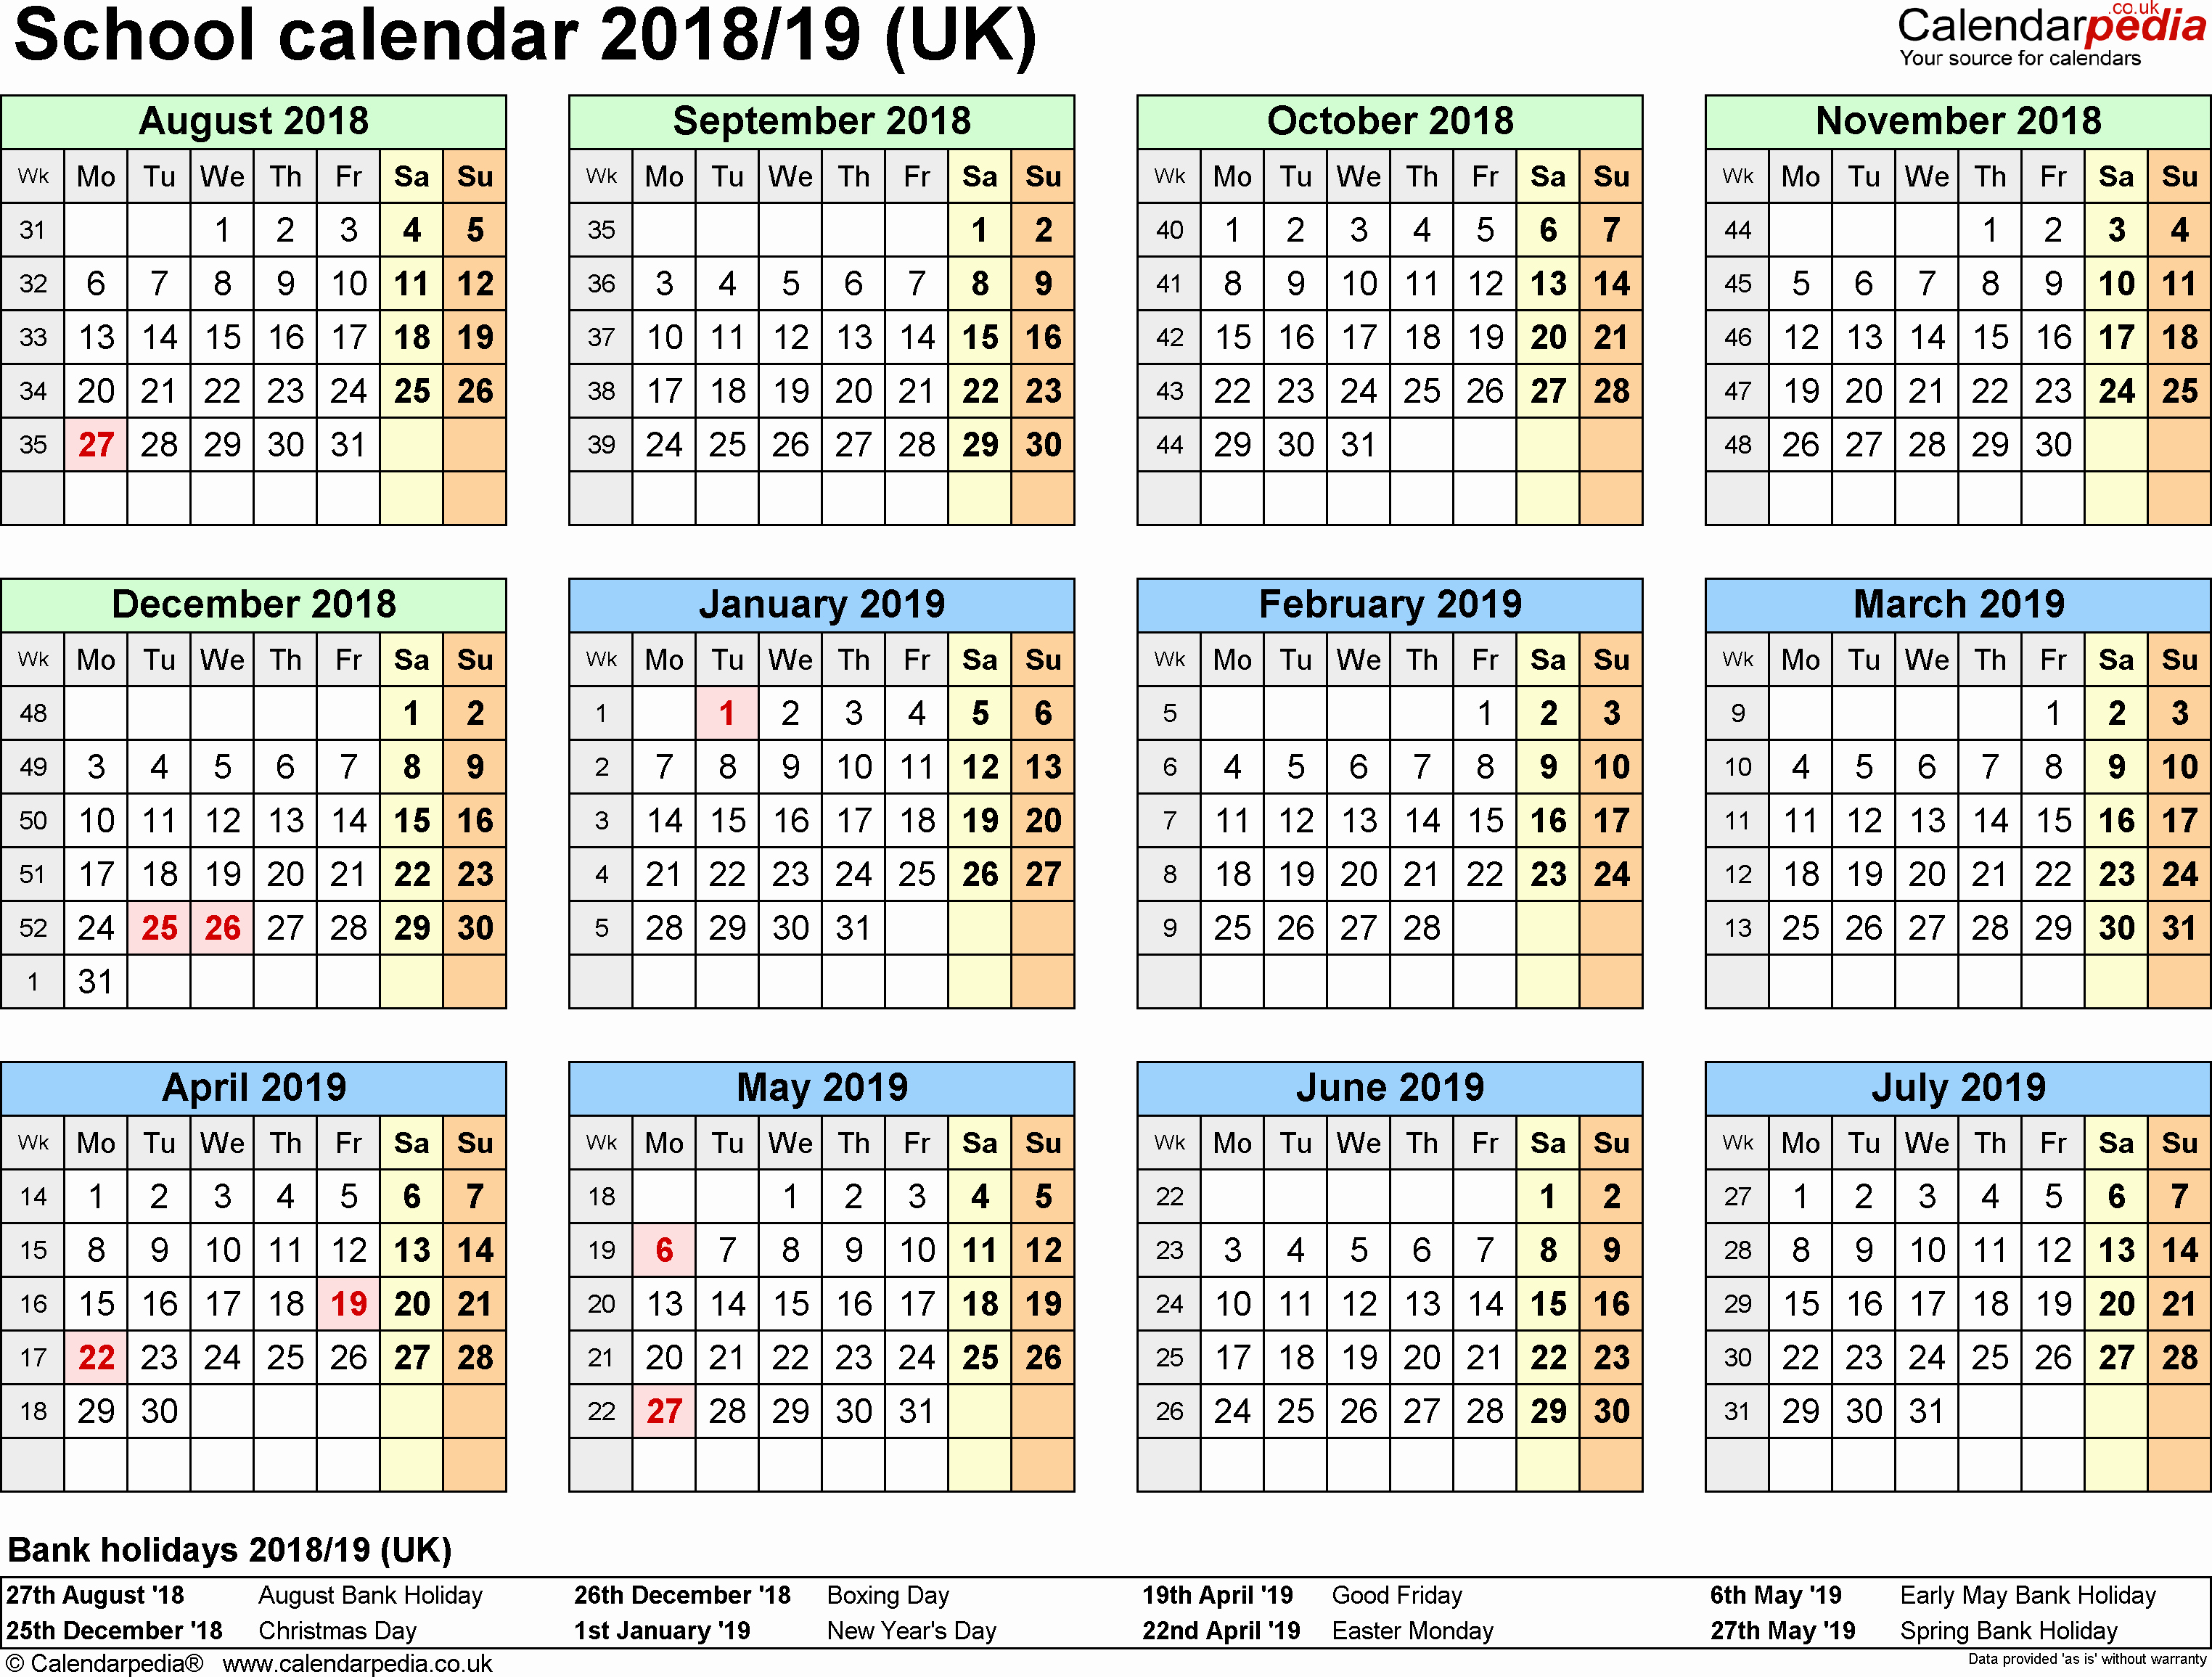 School Calendar 2018 19 Template Inspirational School Calendars 2018 2019 as Free Printable Word Templates